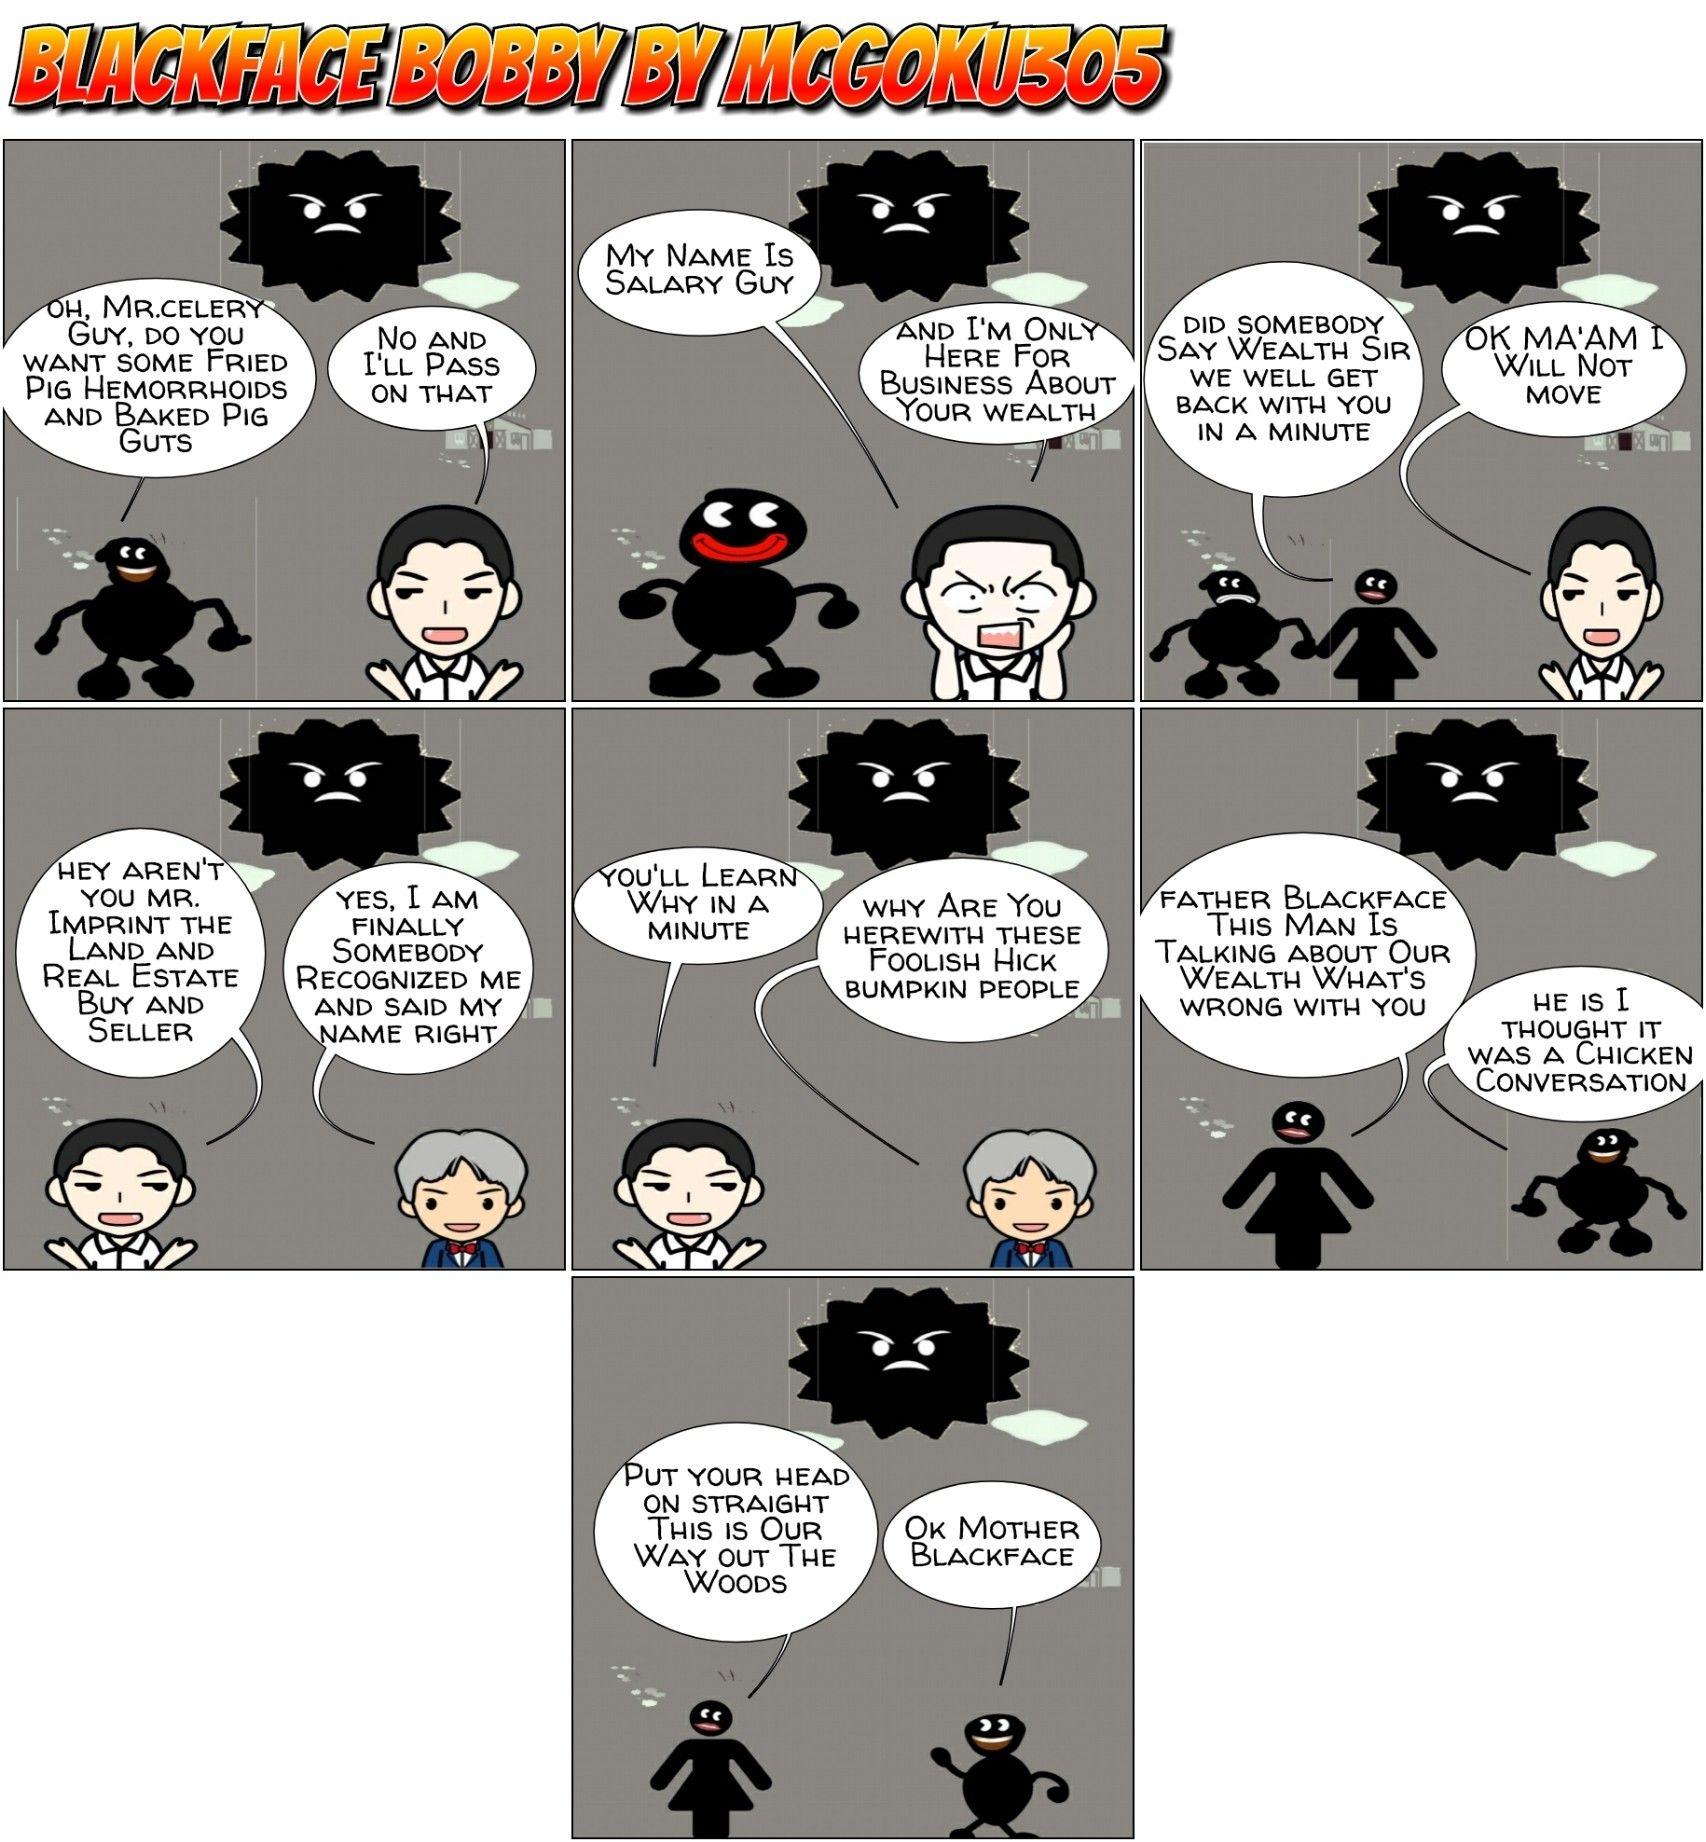 BLACKFACE BOBBY - THE BLACKFACE'S LEARN THEY ARE RICH #COMICS